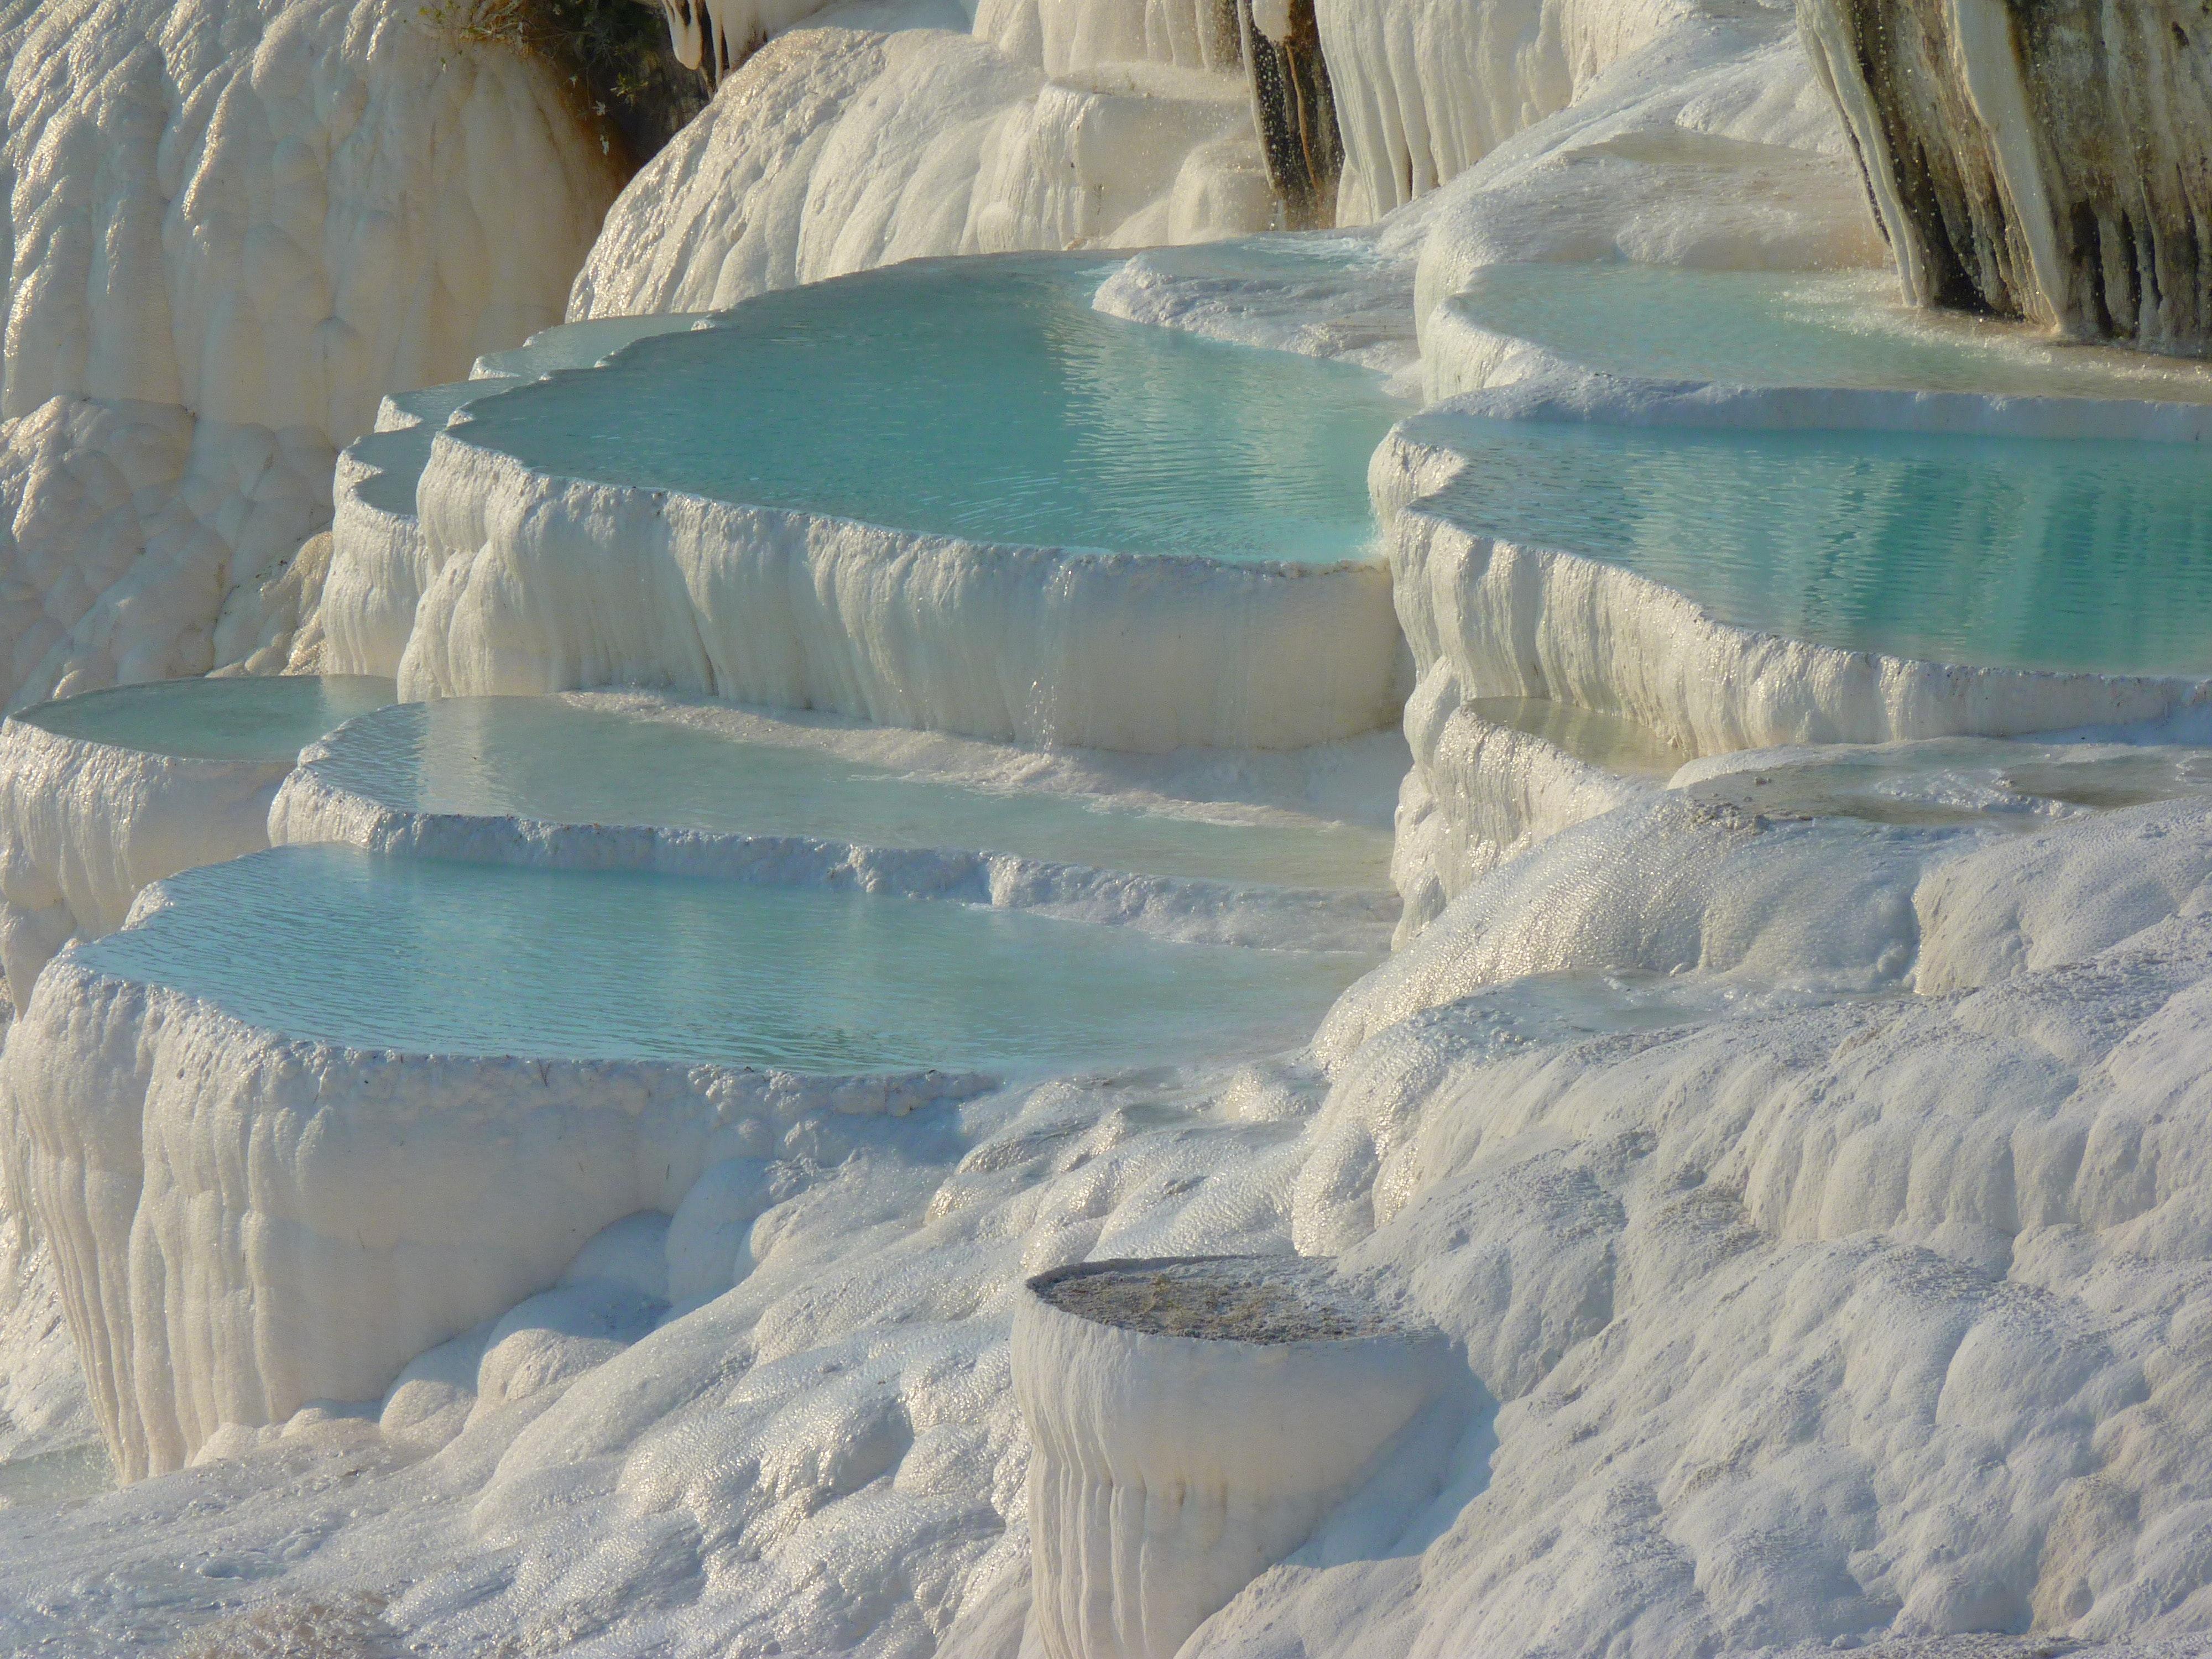 White Glaciers, Cold, Ice, Melting, Snow, HQ Photo